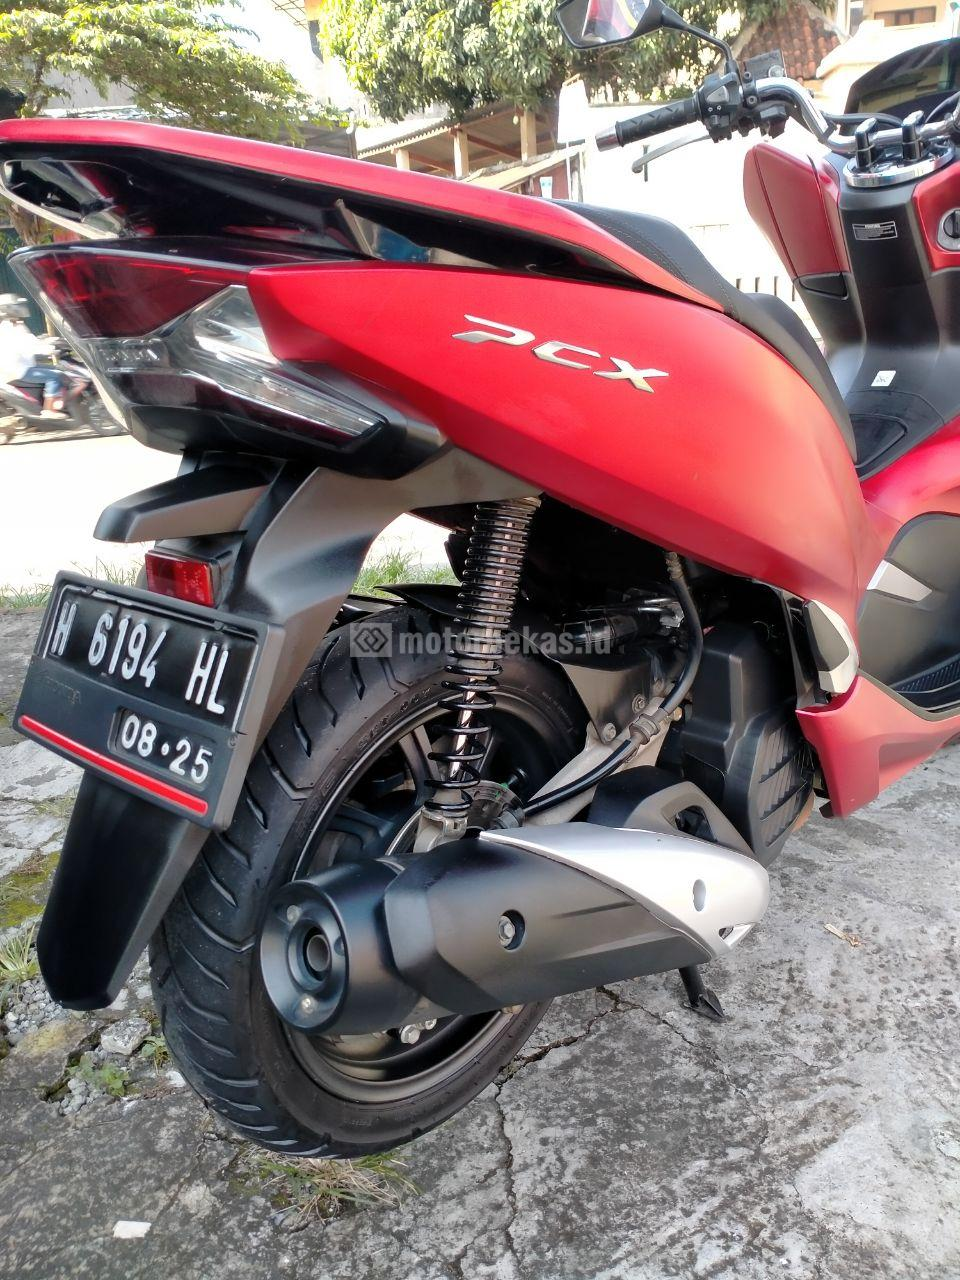 HONDA PCX  3019 motorbekas.id